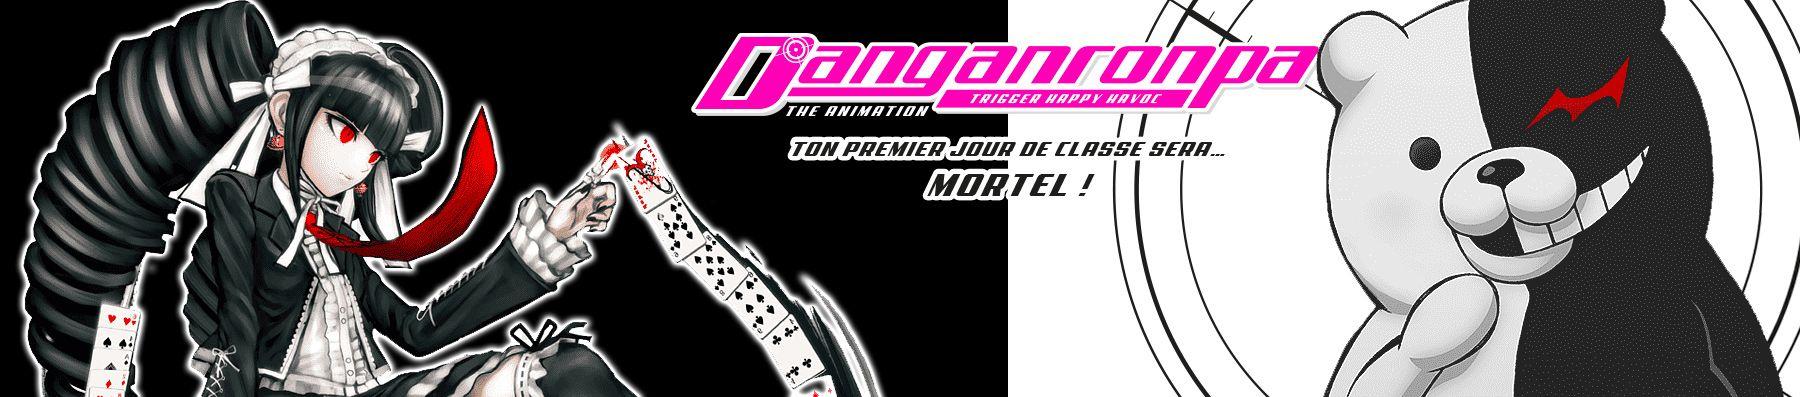 Dossier - Danganronpa